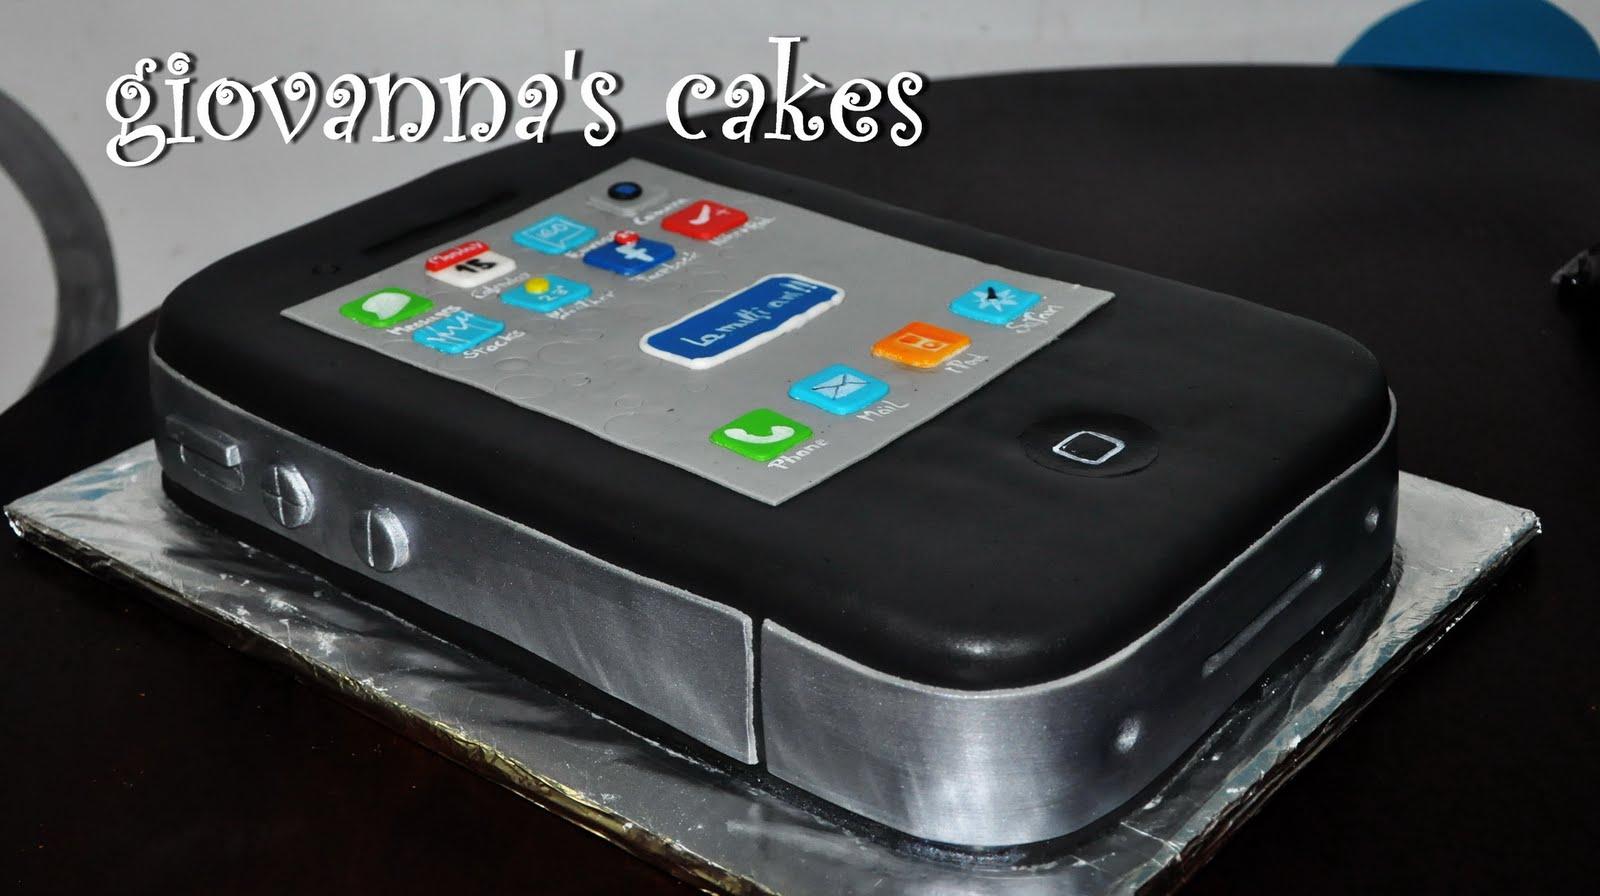 Giovanna S Cakes Iphone 4 Birthday Cake